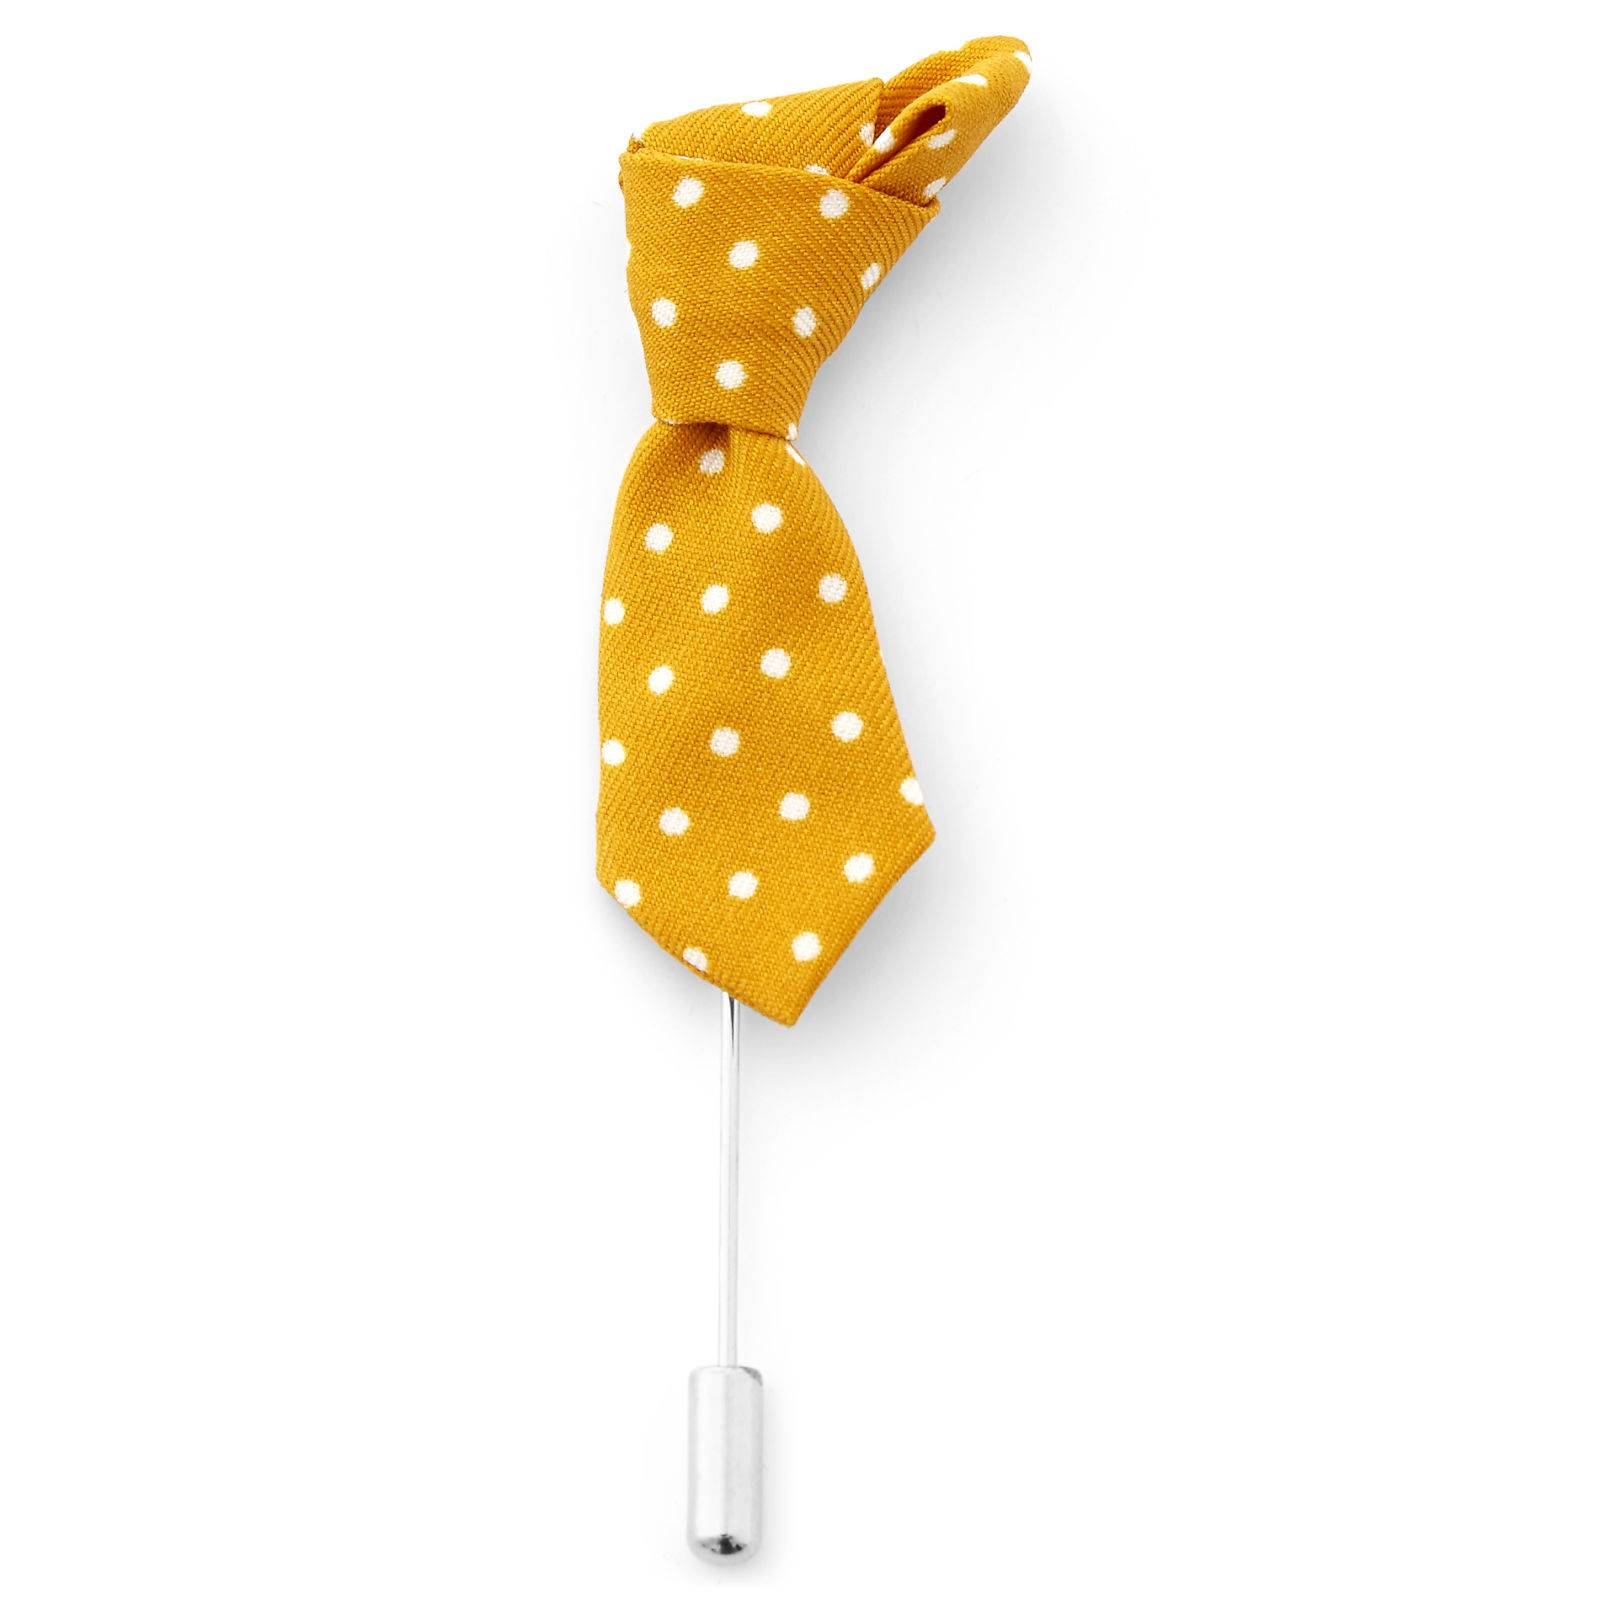 Warren Asher Keltainen Polka Dots solmio -rintaneula